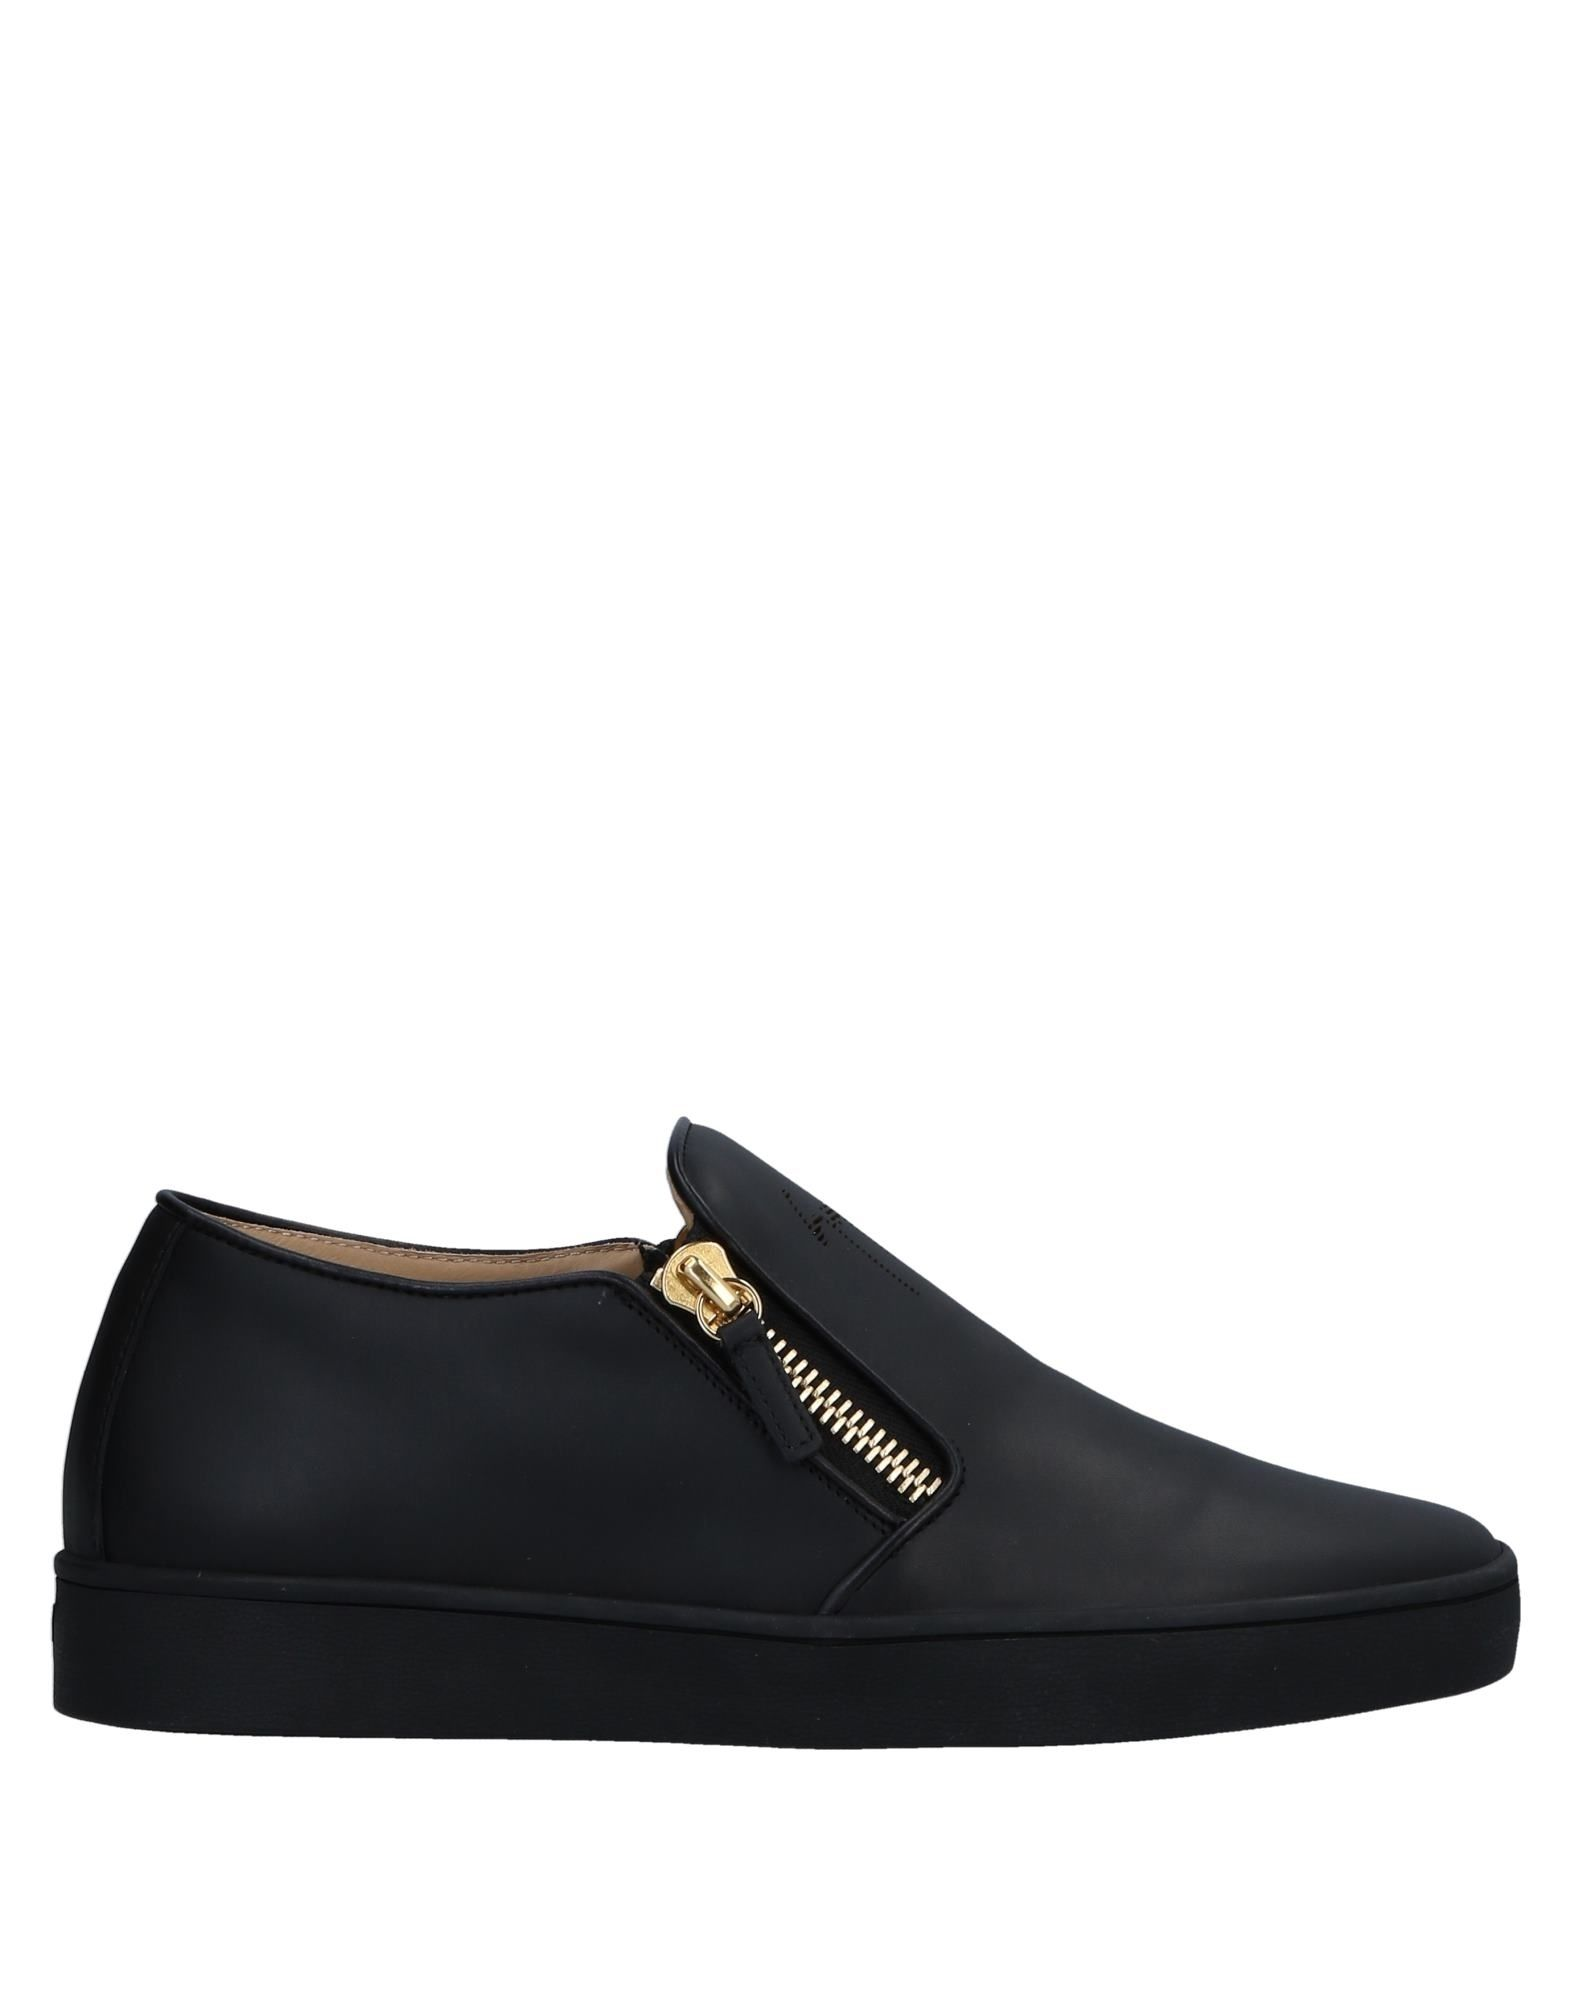 Giuseppe Zanotti Sneakers Herren  11518112XF Gute Qualität beliebte Schuhe